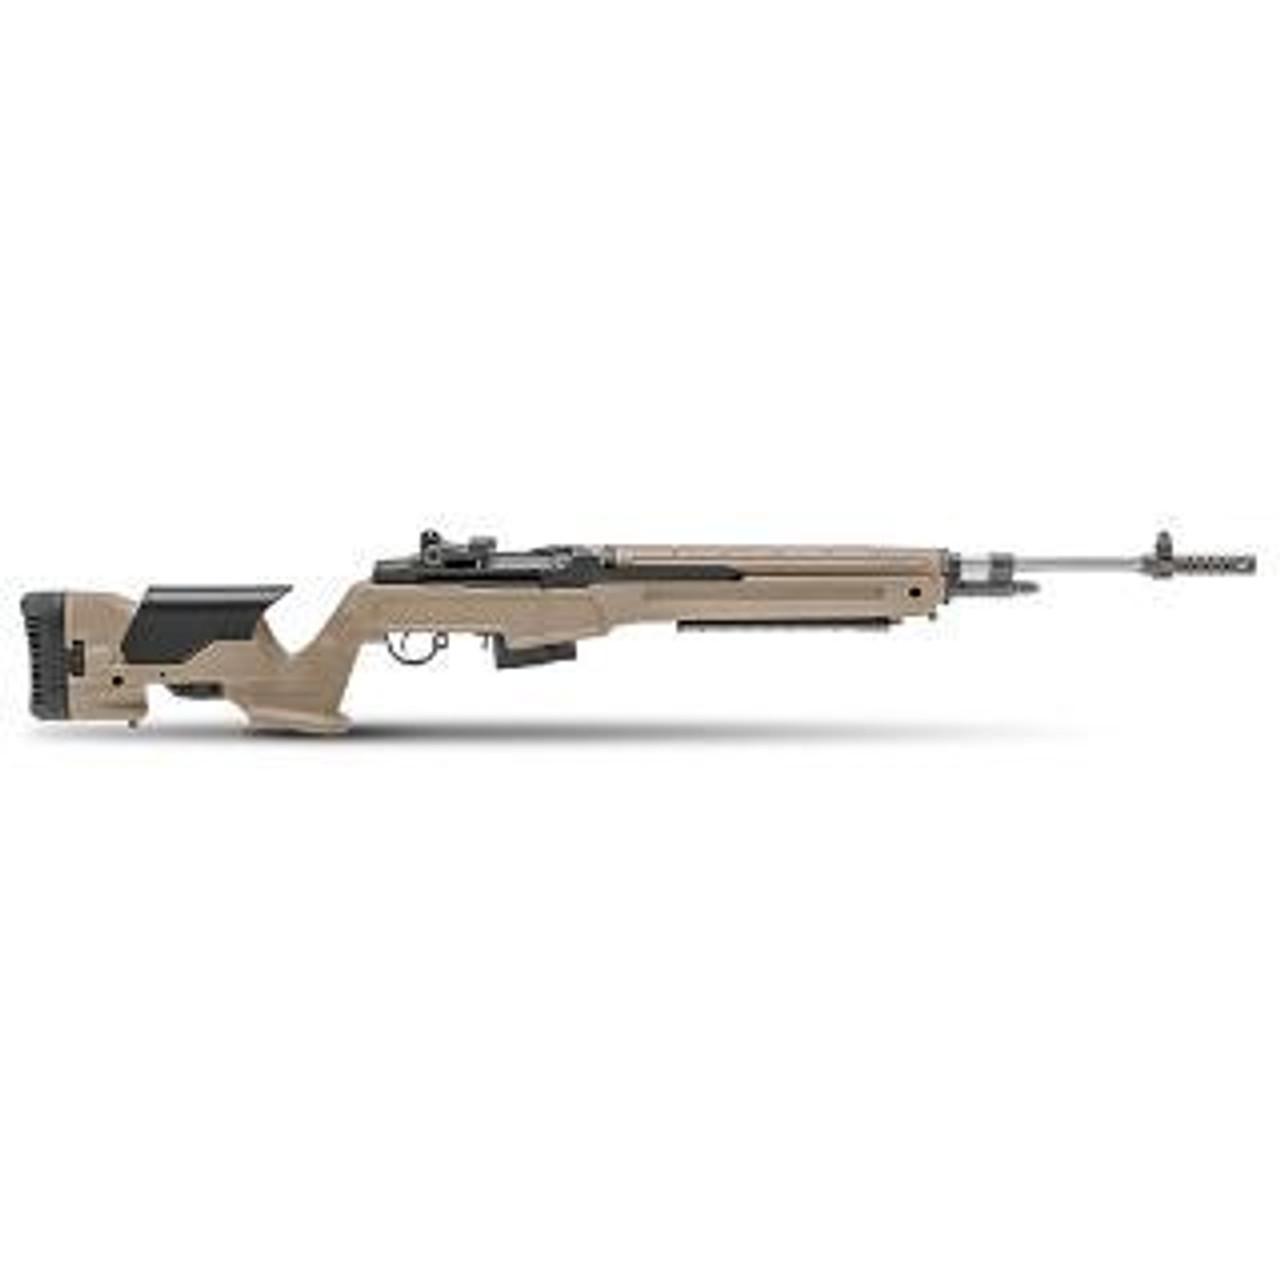 Springfield Armory M1A-Precision Adjustable Rifle-NM Barrel CALIFORNIA LEGAL- 6.5Creedmoor-FDE